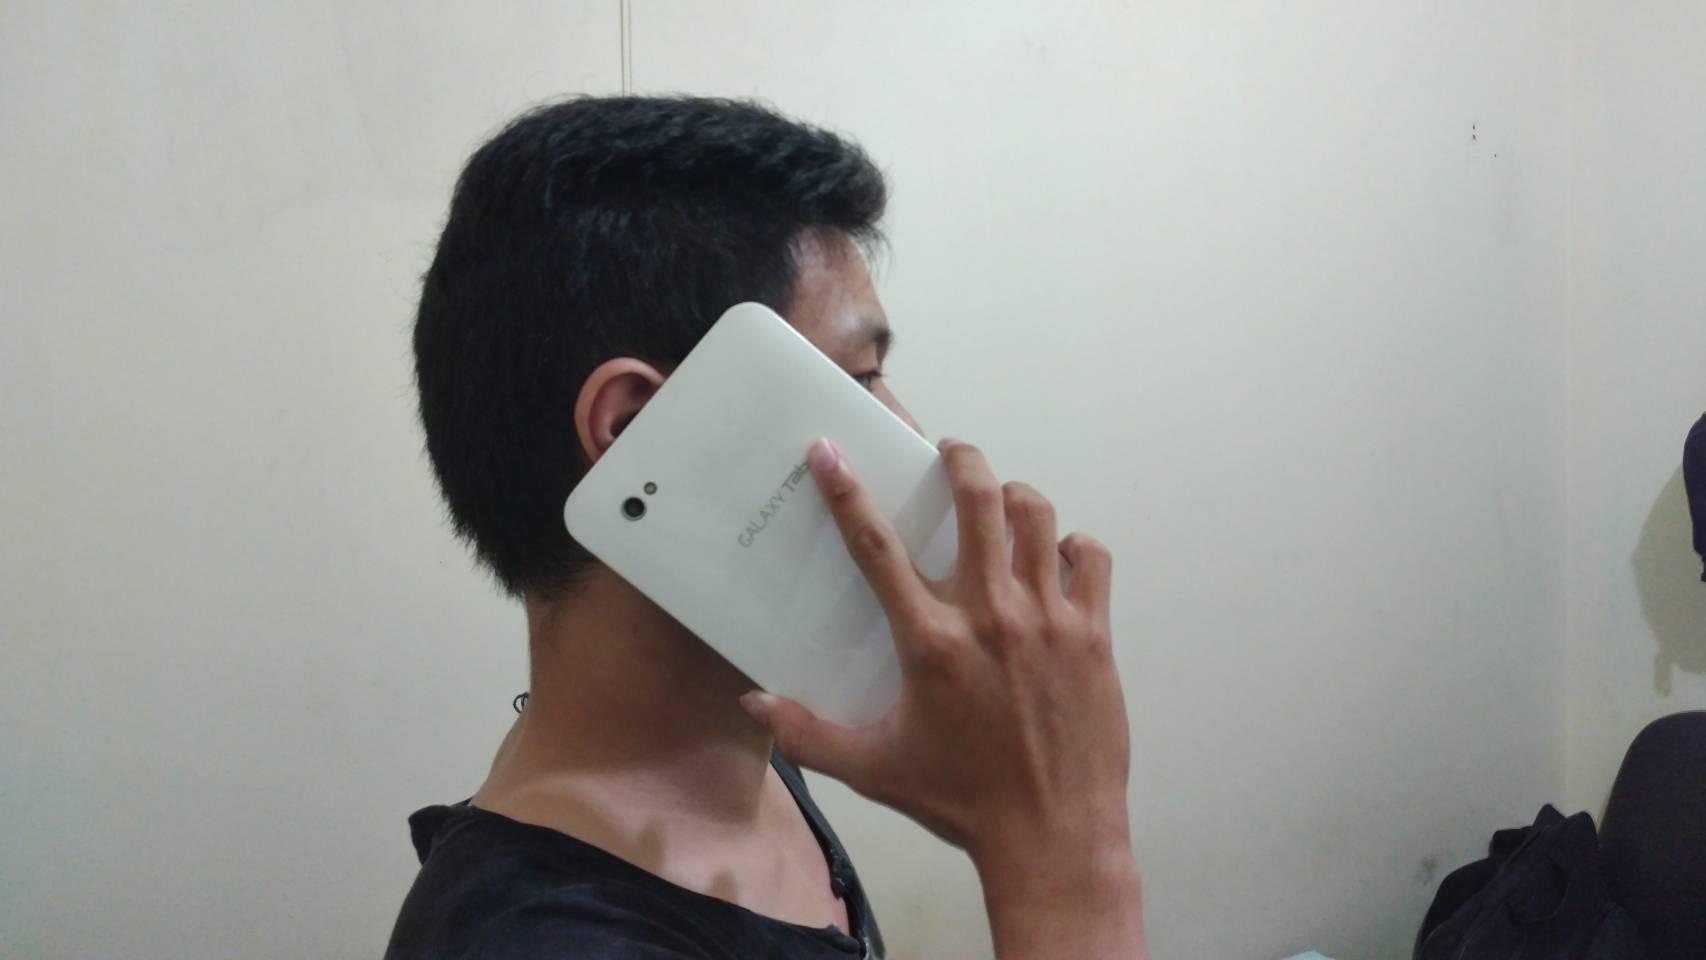 Tablet saat menerima telephone